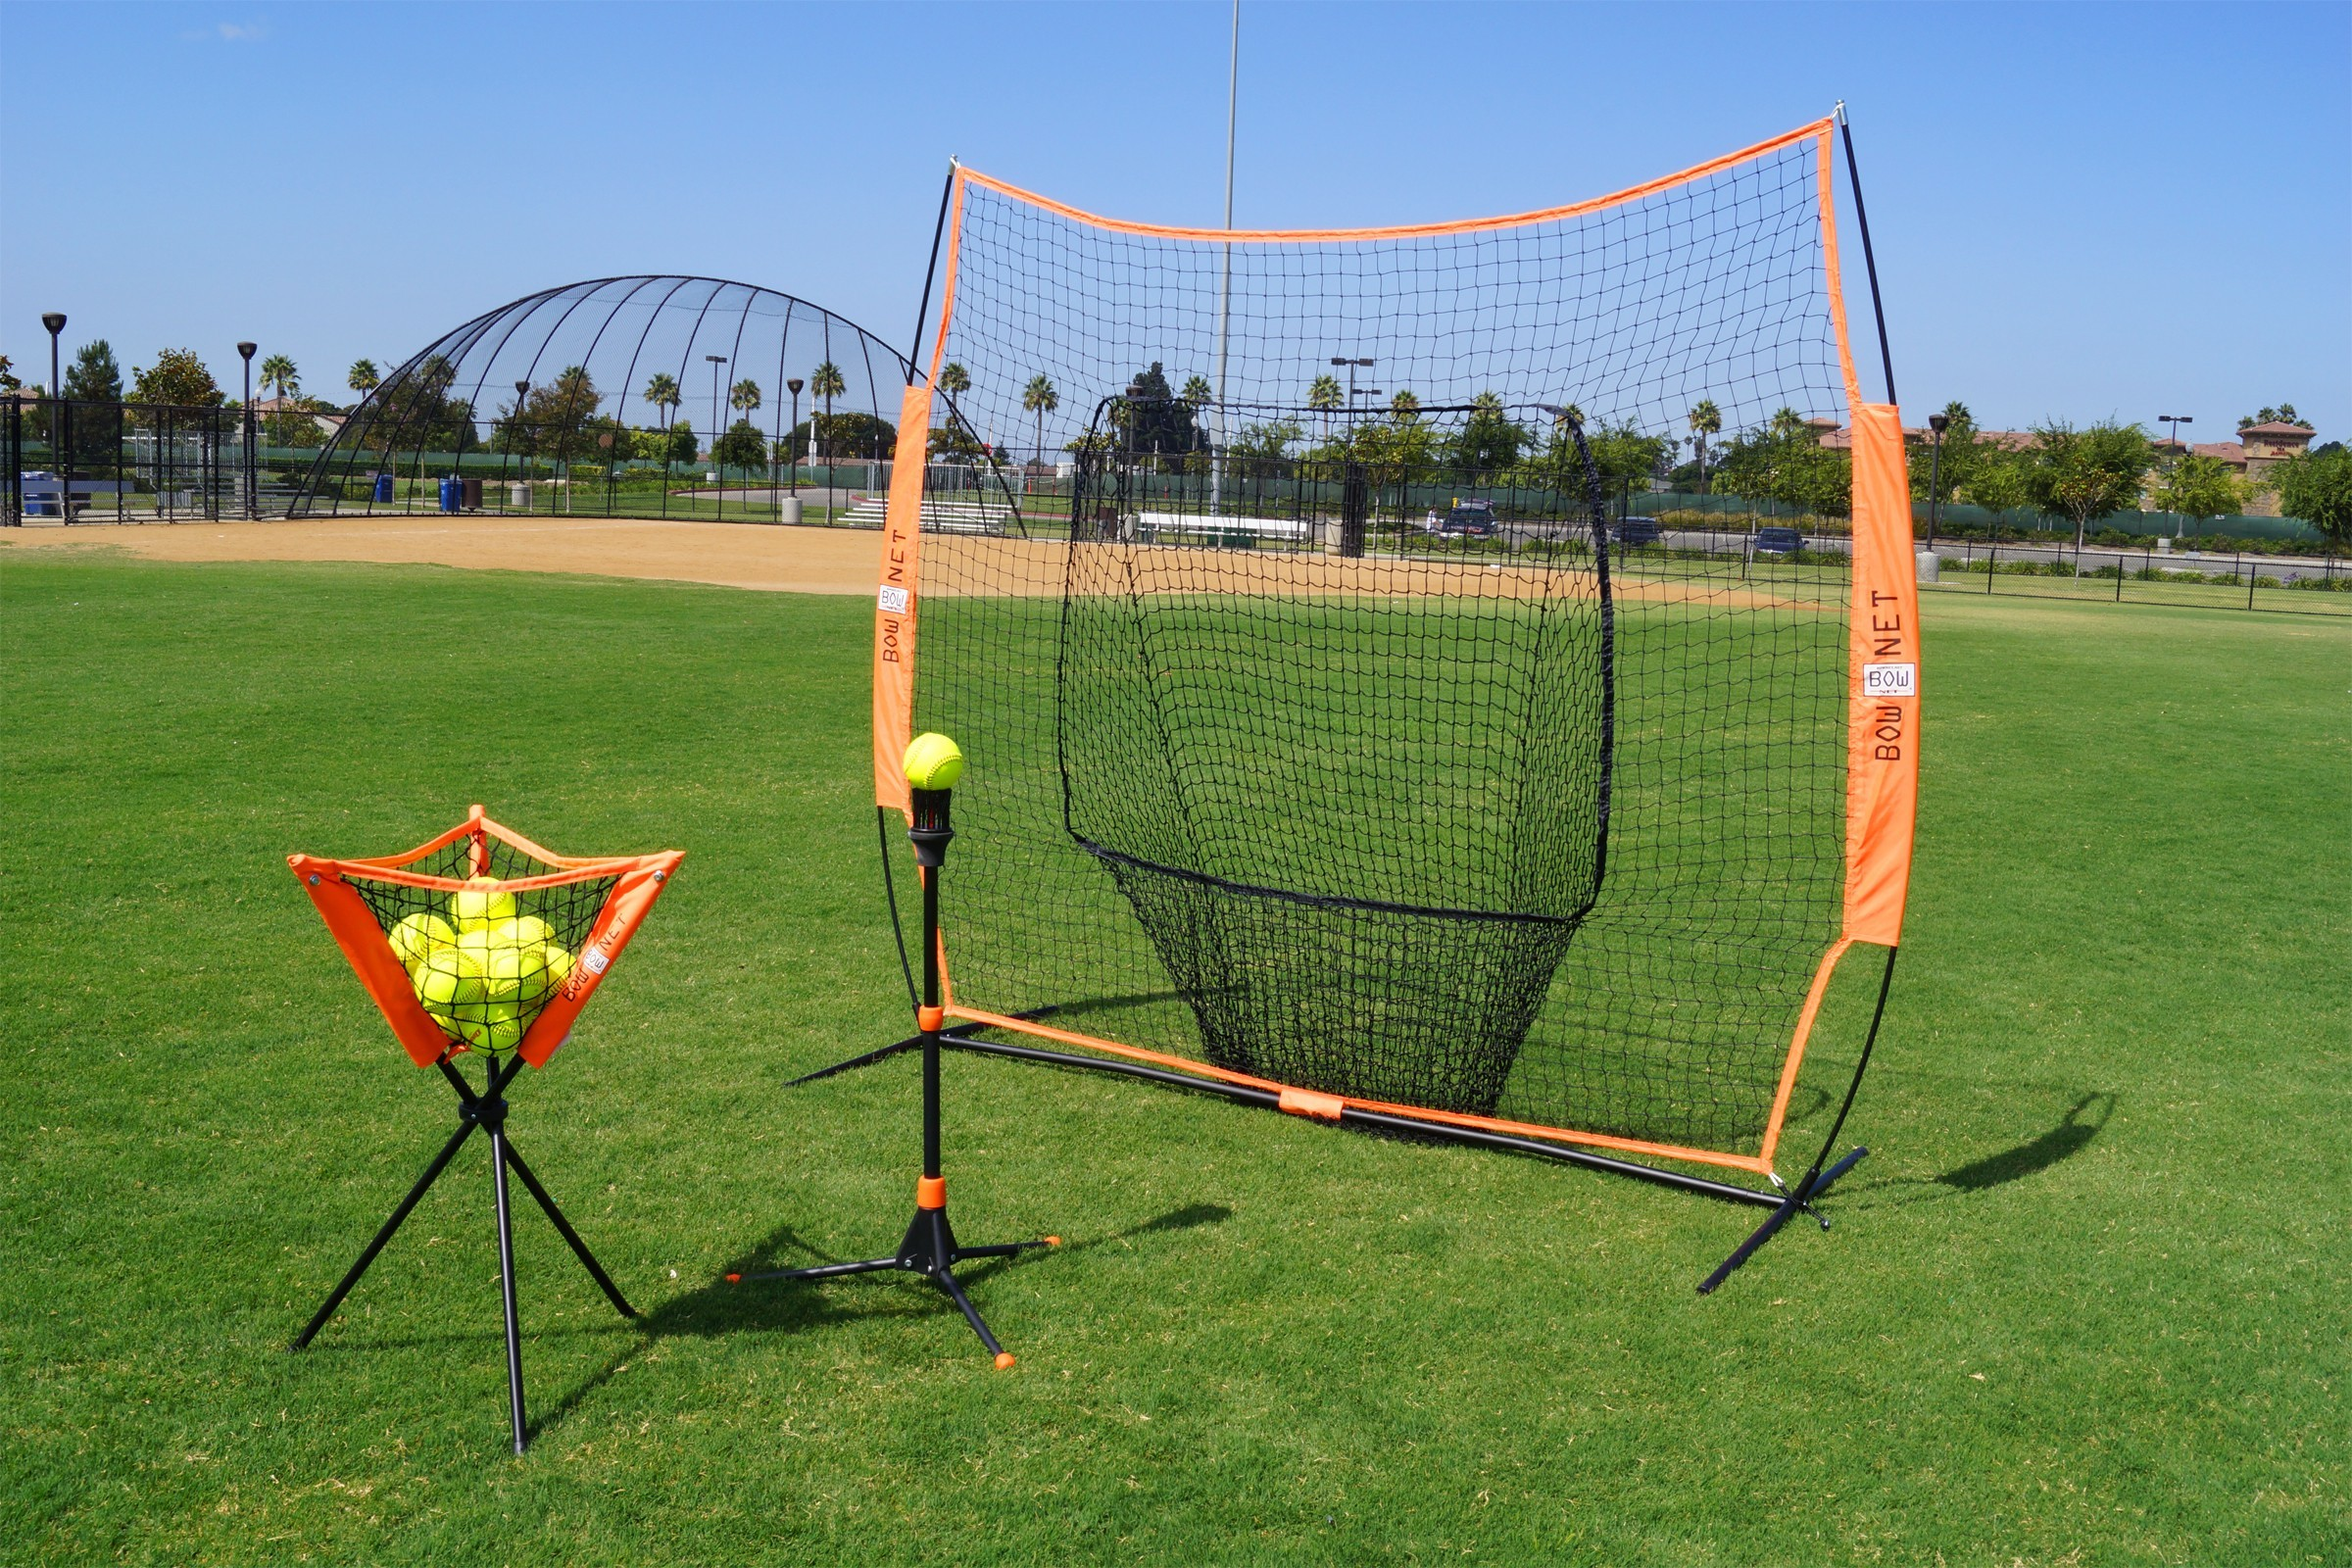 Bownet Bownet Batting Practice Bownet Baseball//Softball Big Mouth Portable Net